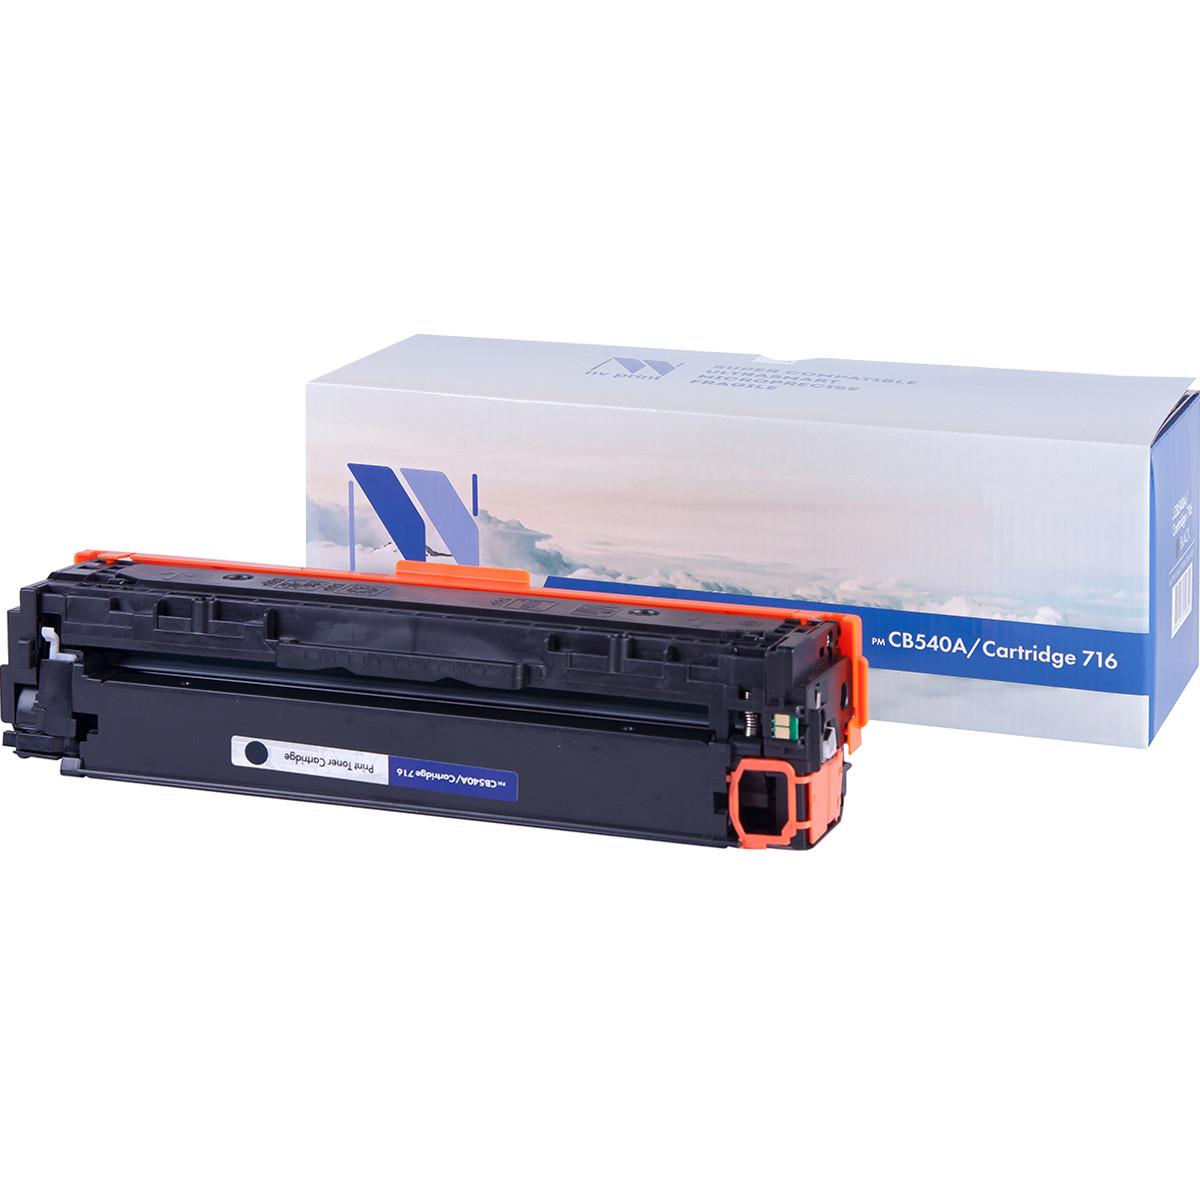 Картридж NVP совместимый HP CB540A/Canon 716 Black для LaserJet Color CP1215/CM1312/CM1312nfi/CP1215/Canon i-SENSYS